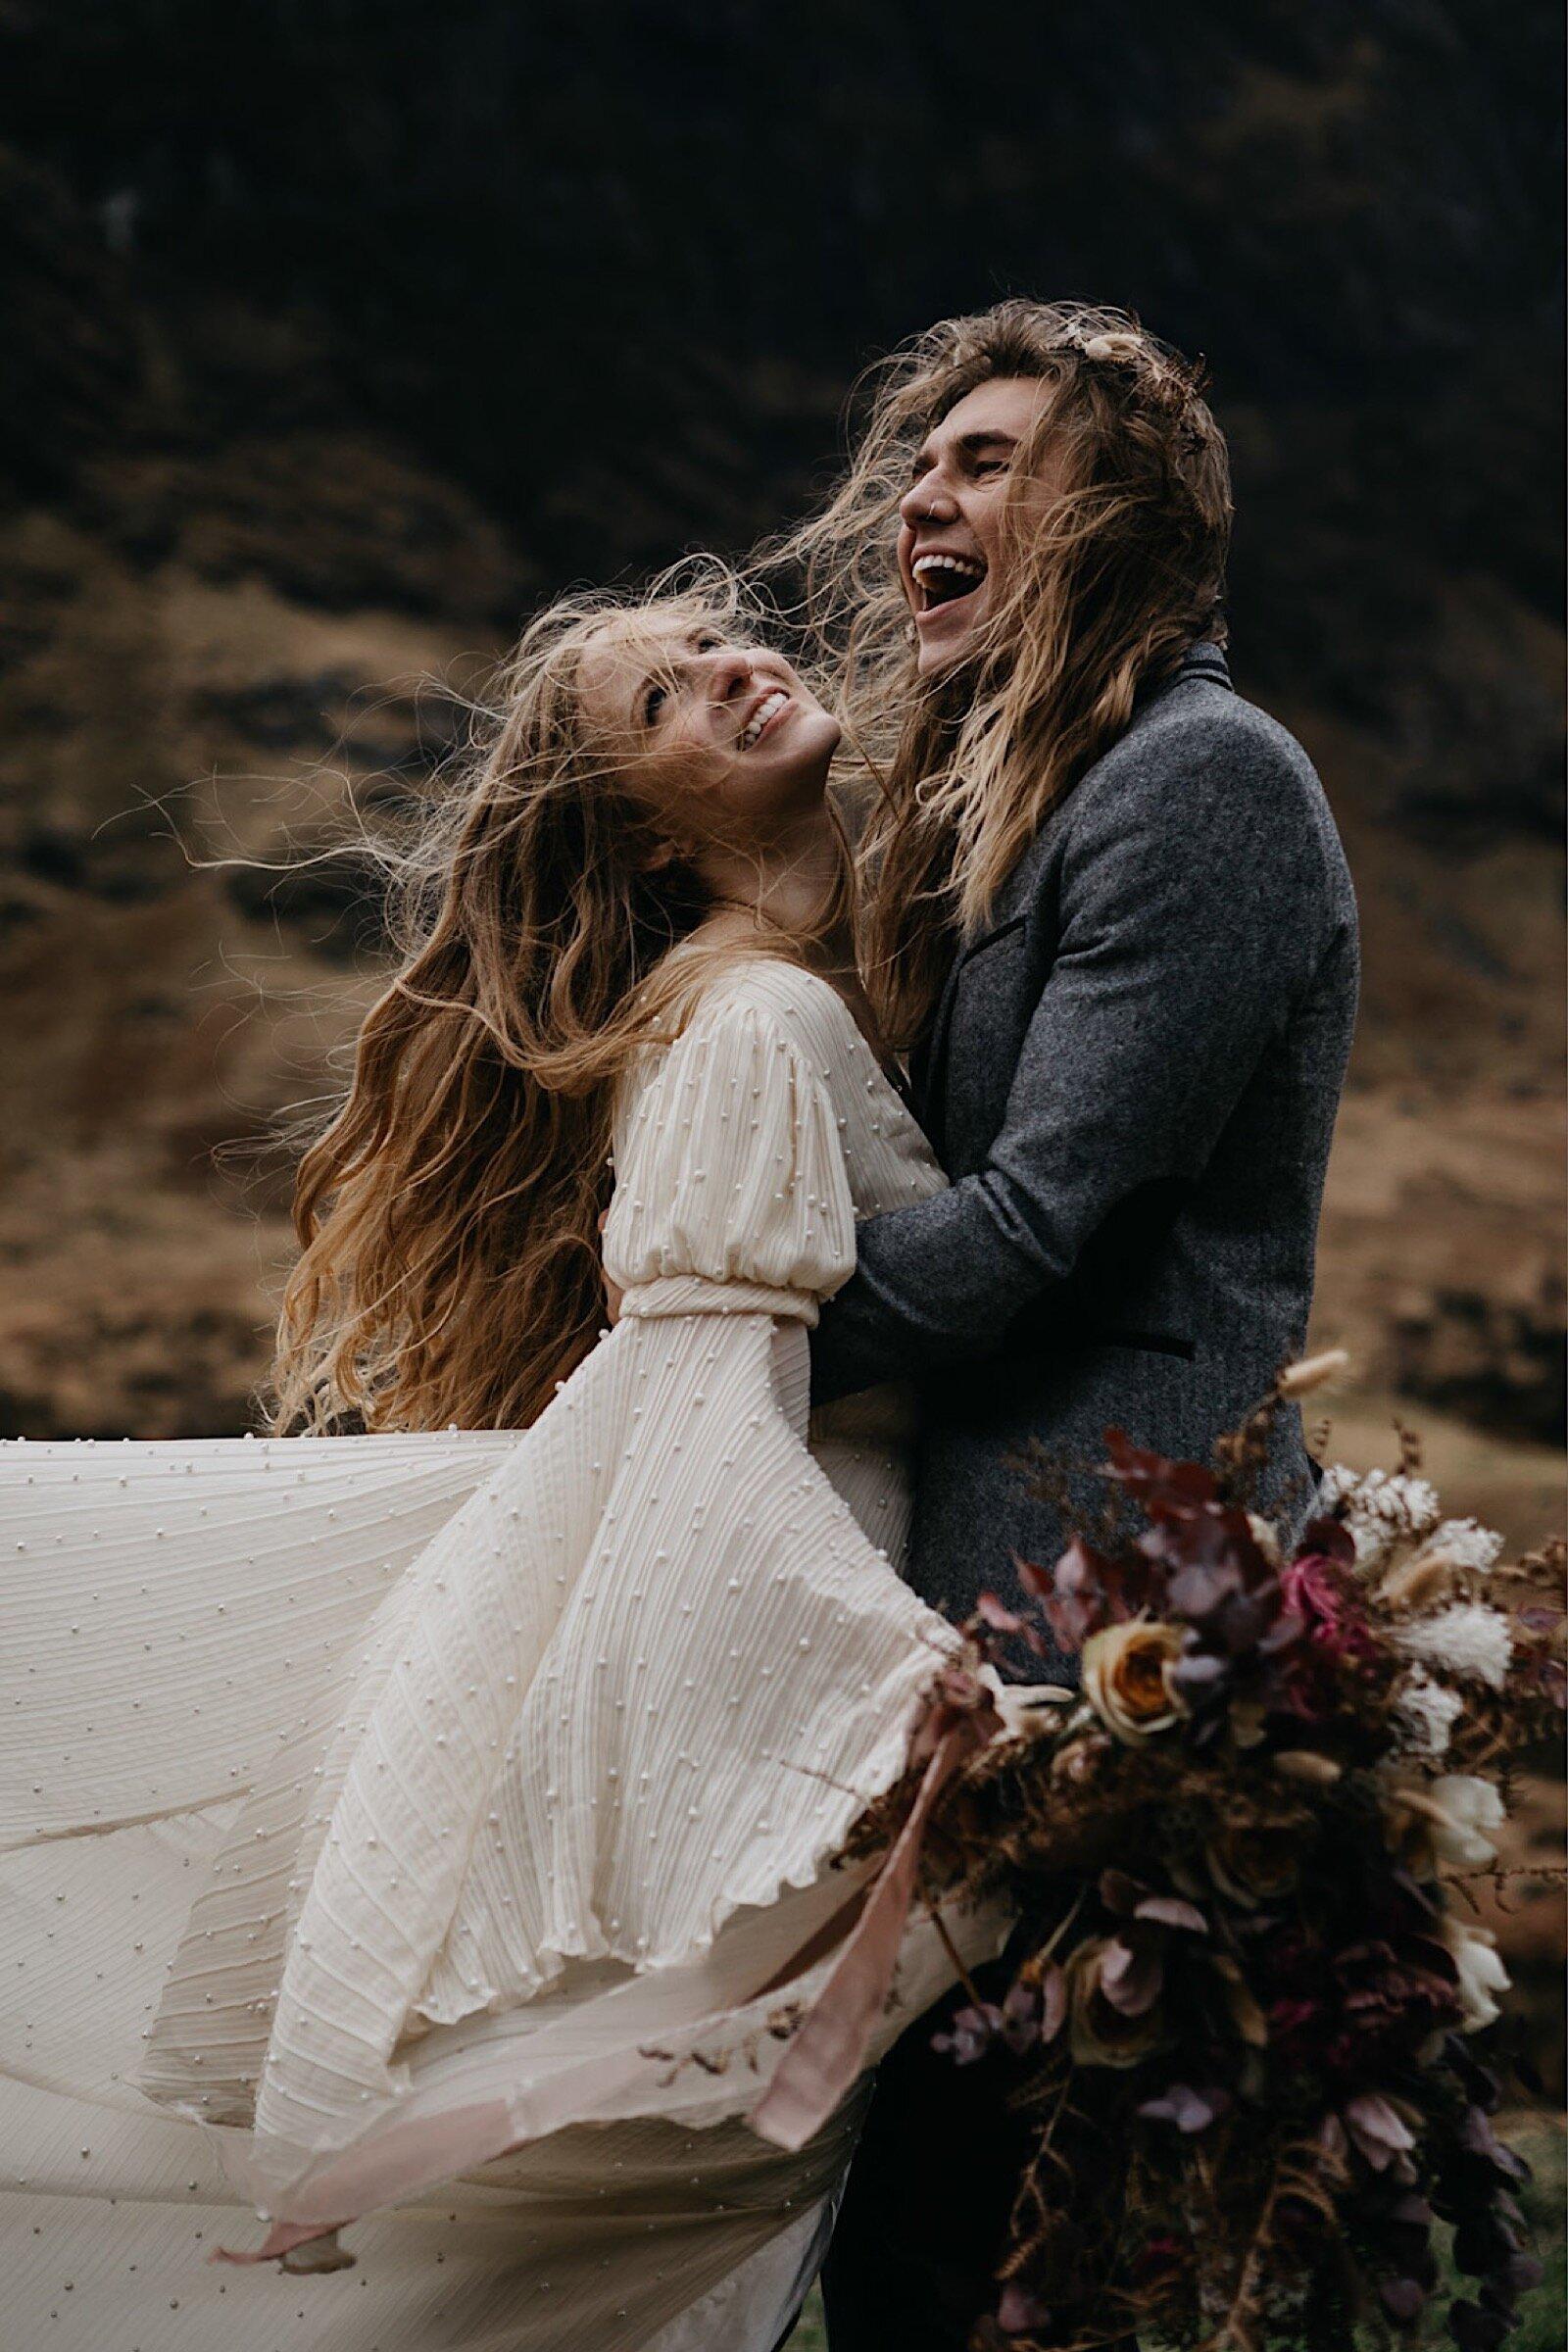 15_scotland_couple_shoot_lety_photography (13 von 39).jpg